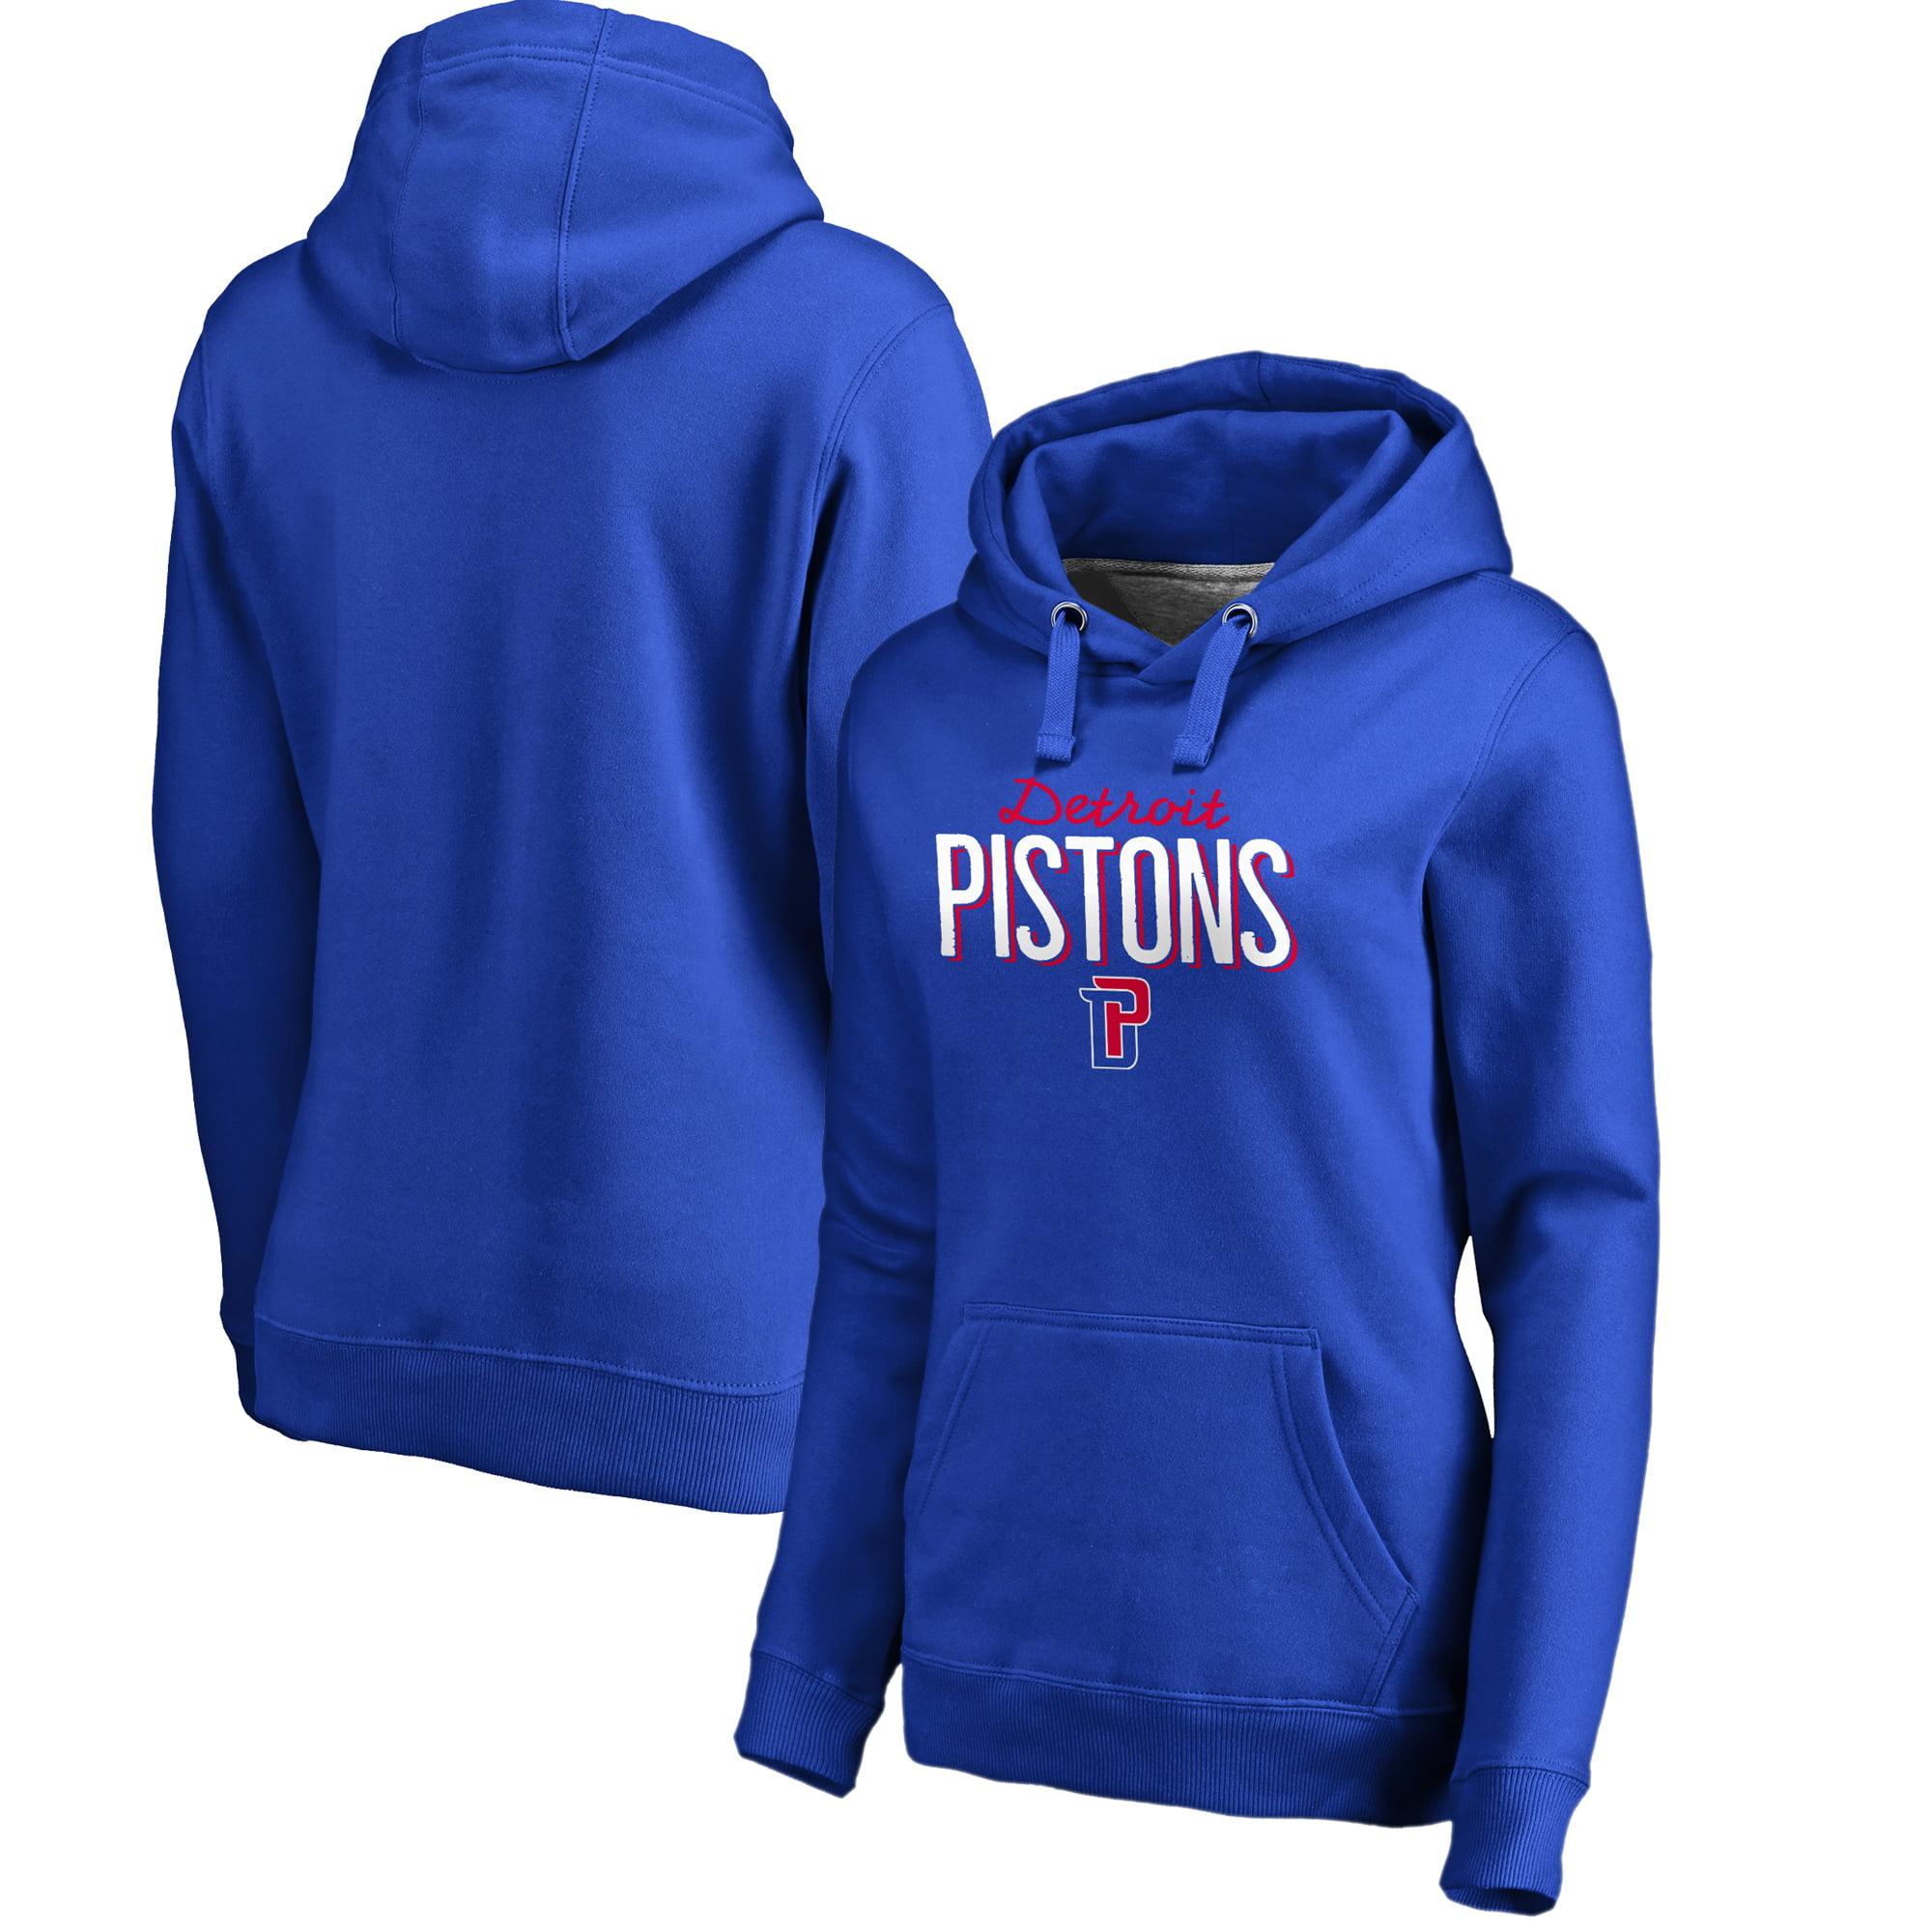 Detroit Pistons Women's Nostalgia Pullover Hoodie - Royal